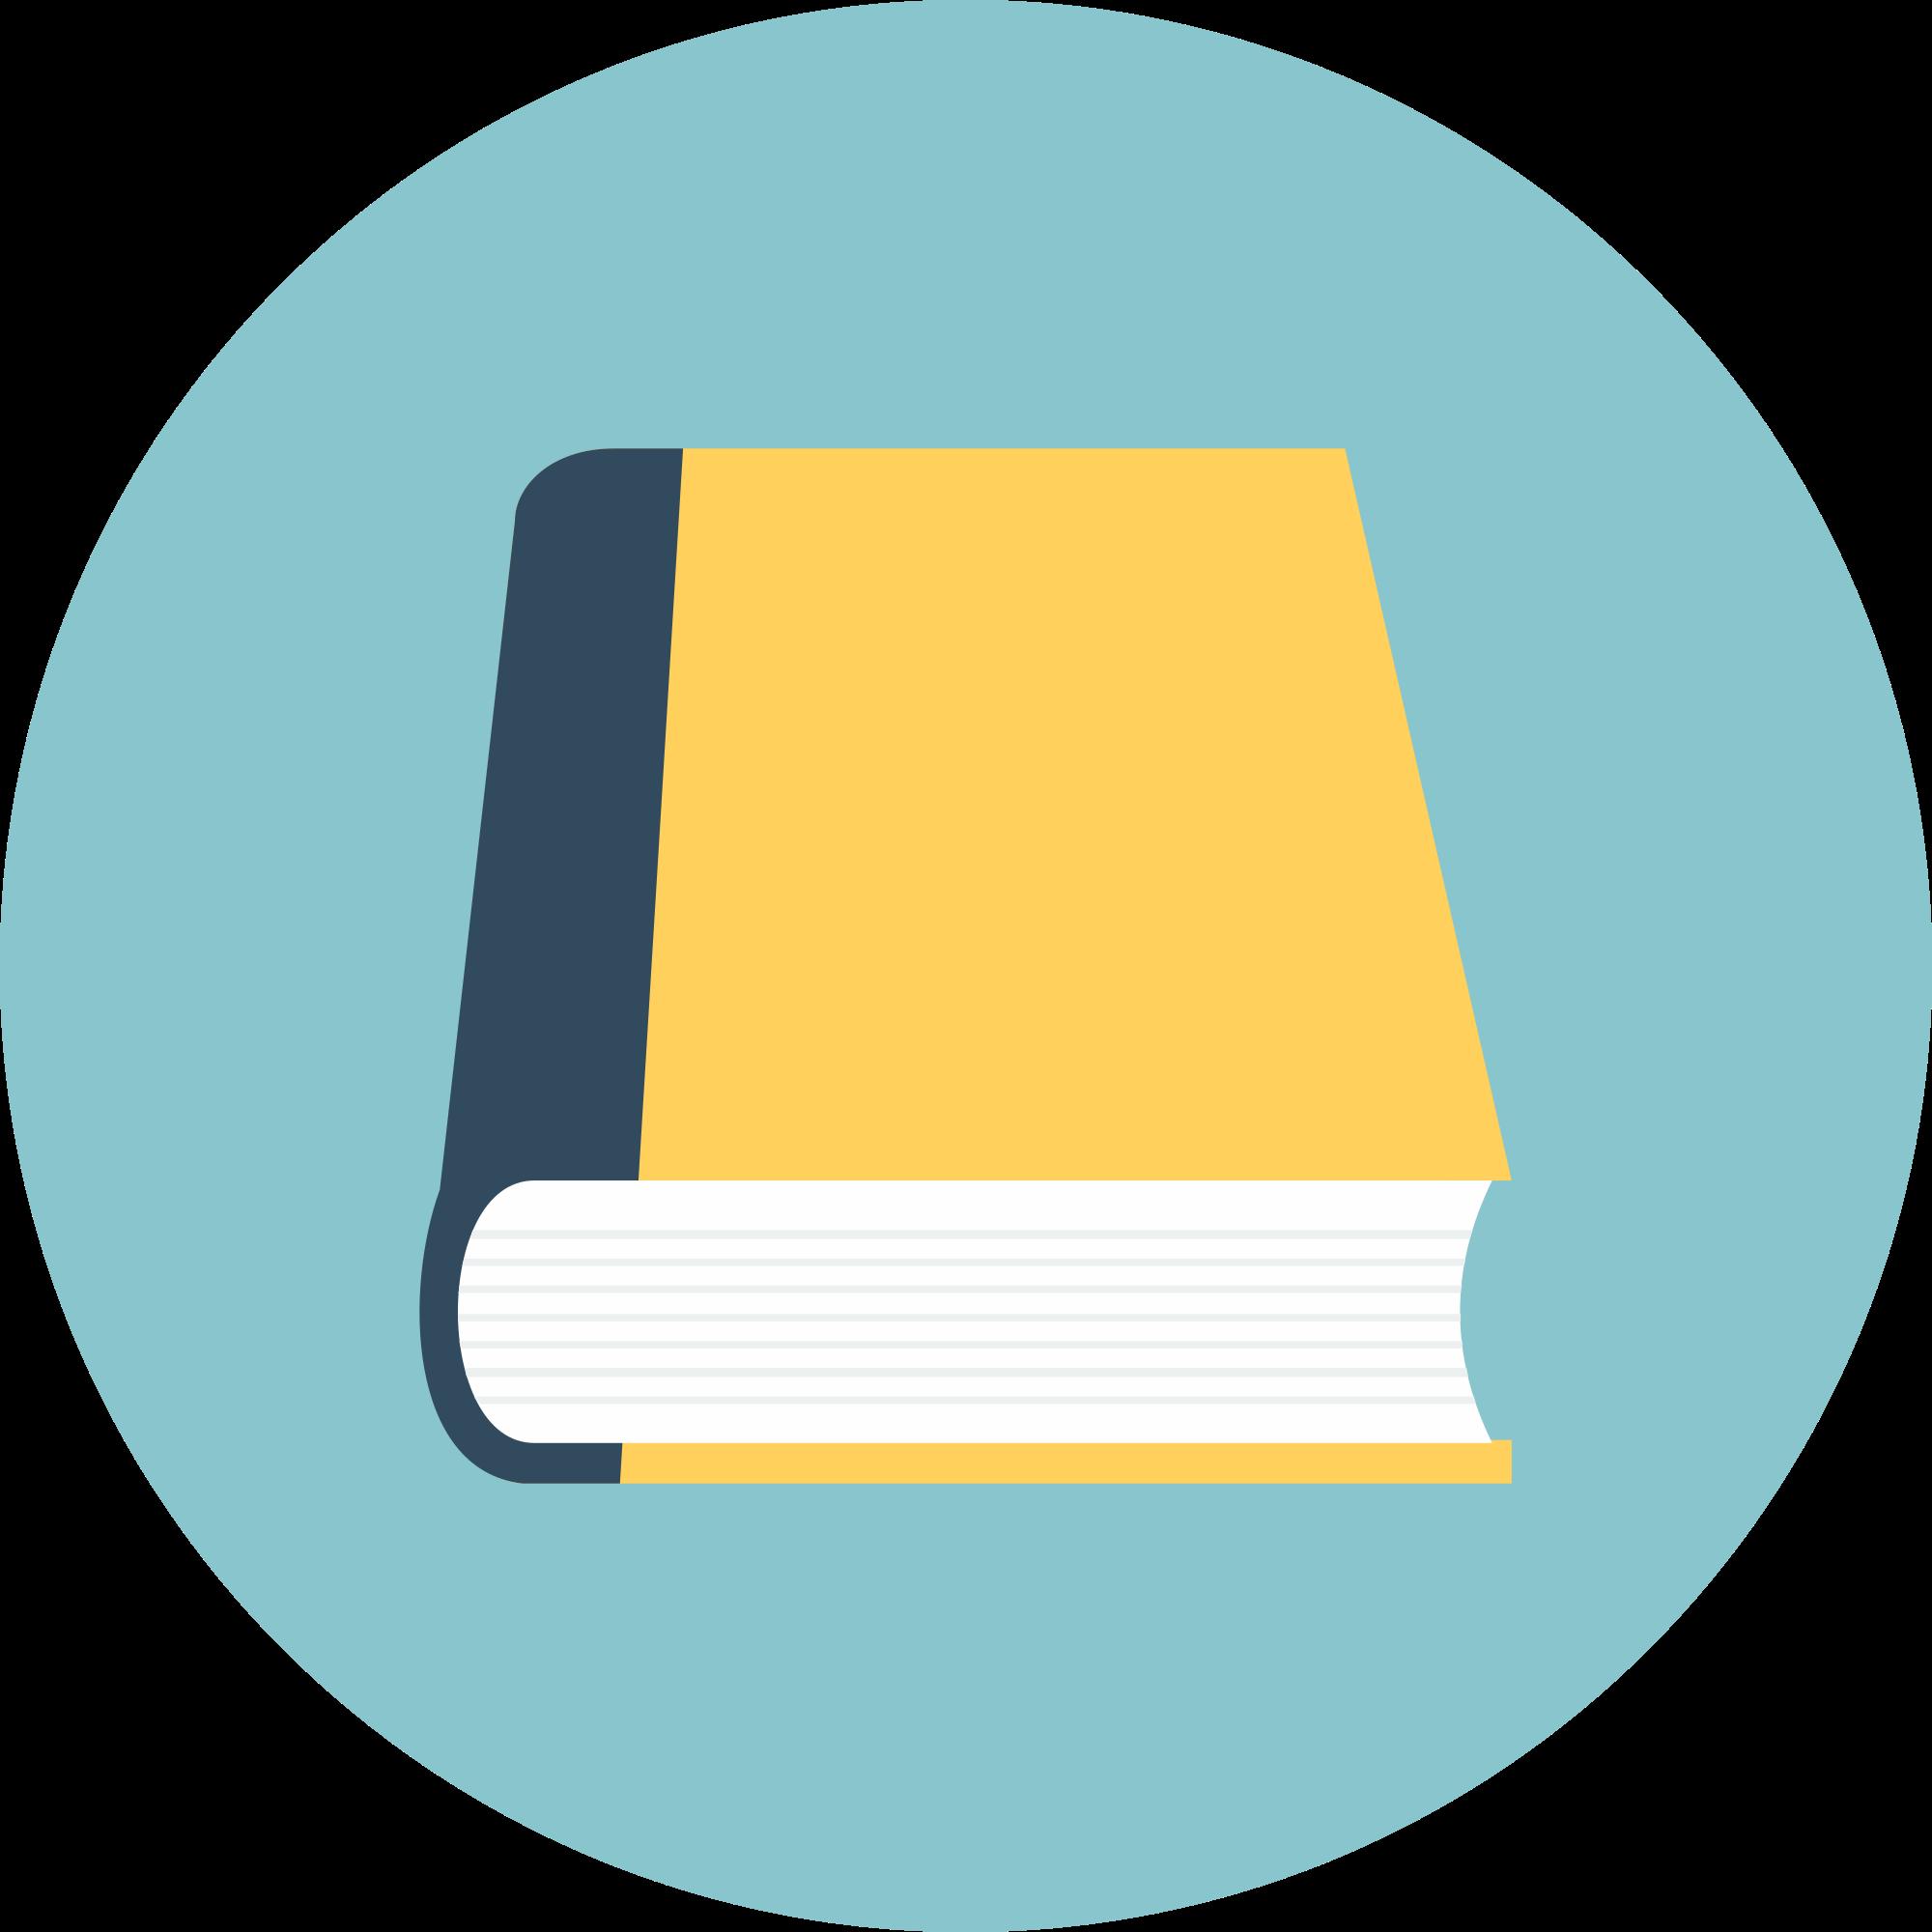 File closed svg wikimedia. Book icon png